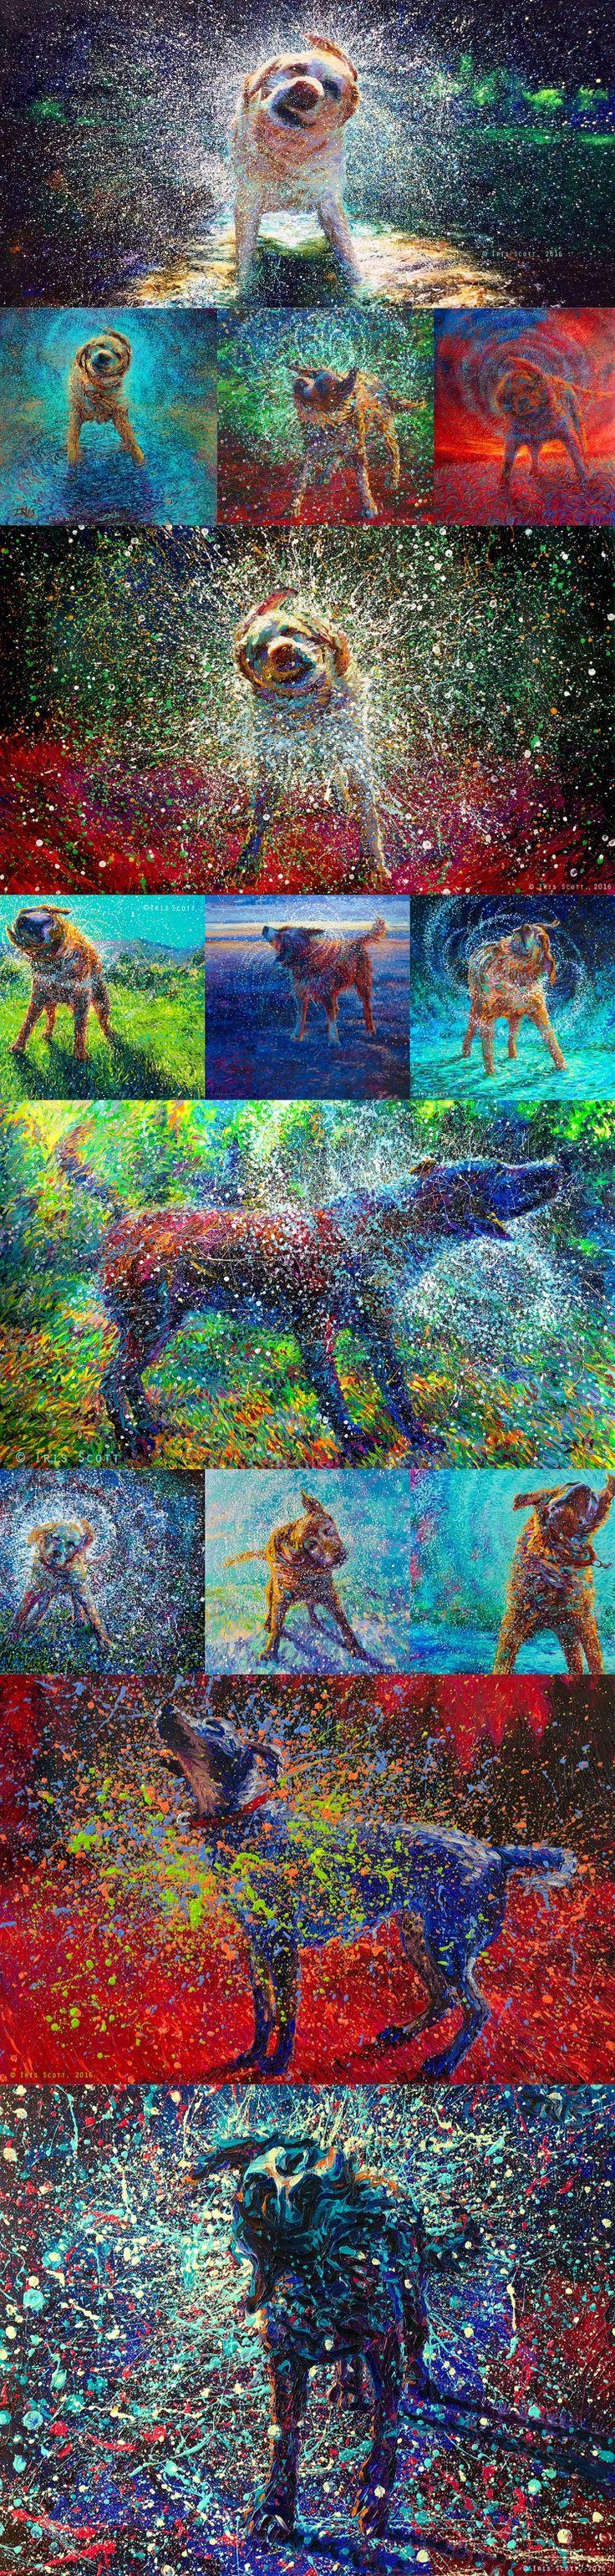 iris scott, art, painting, finger paintings, animals, dogs